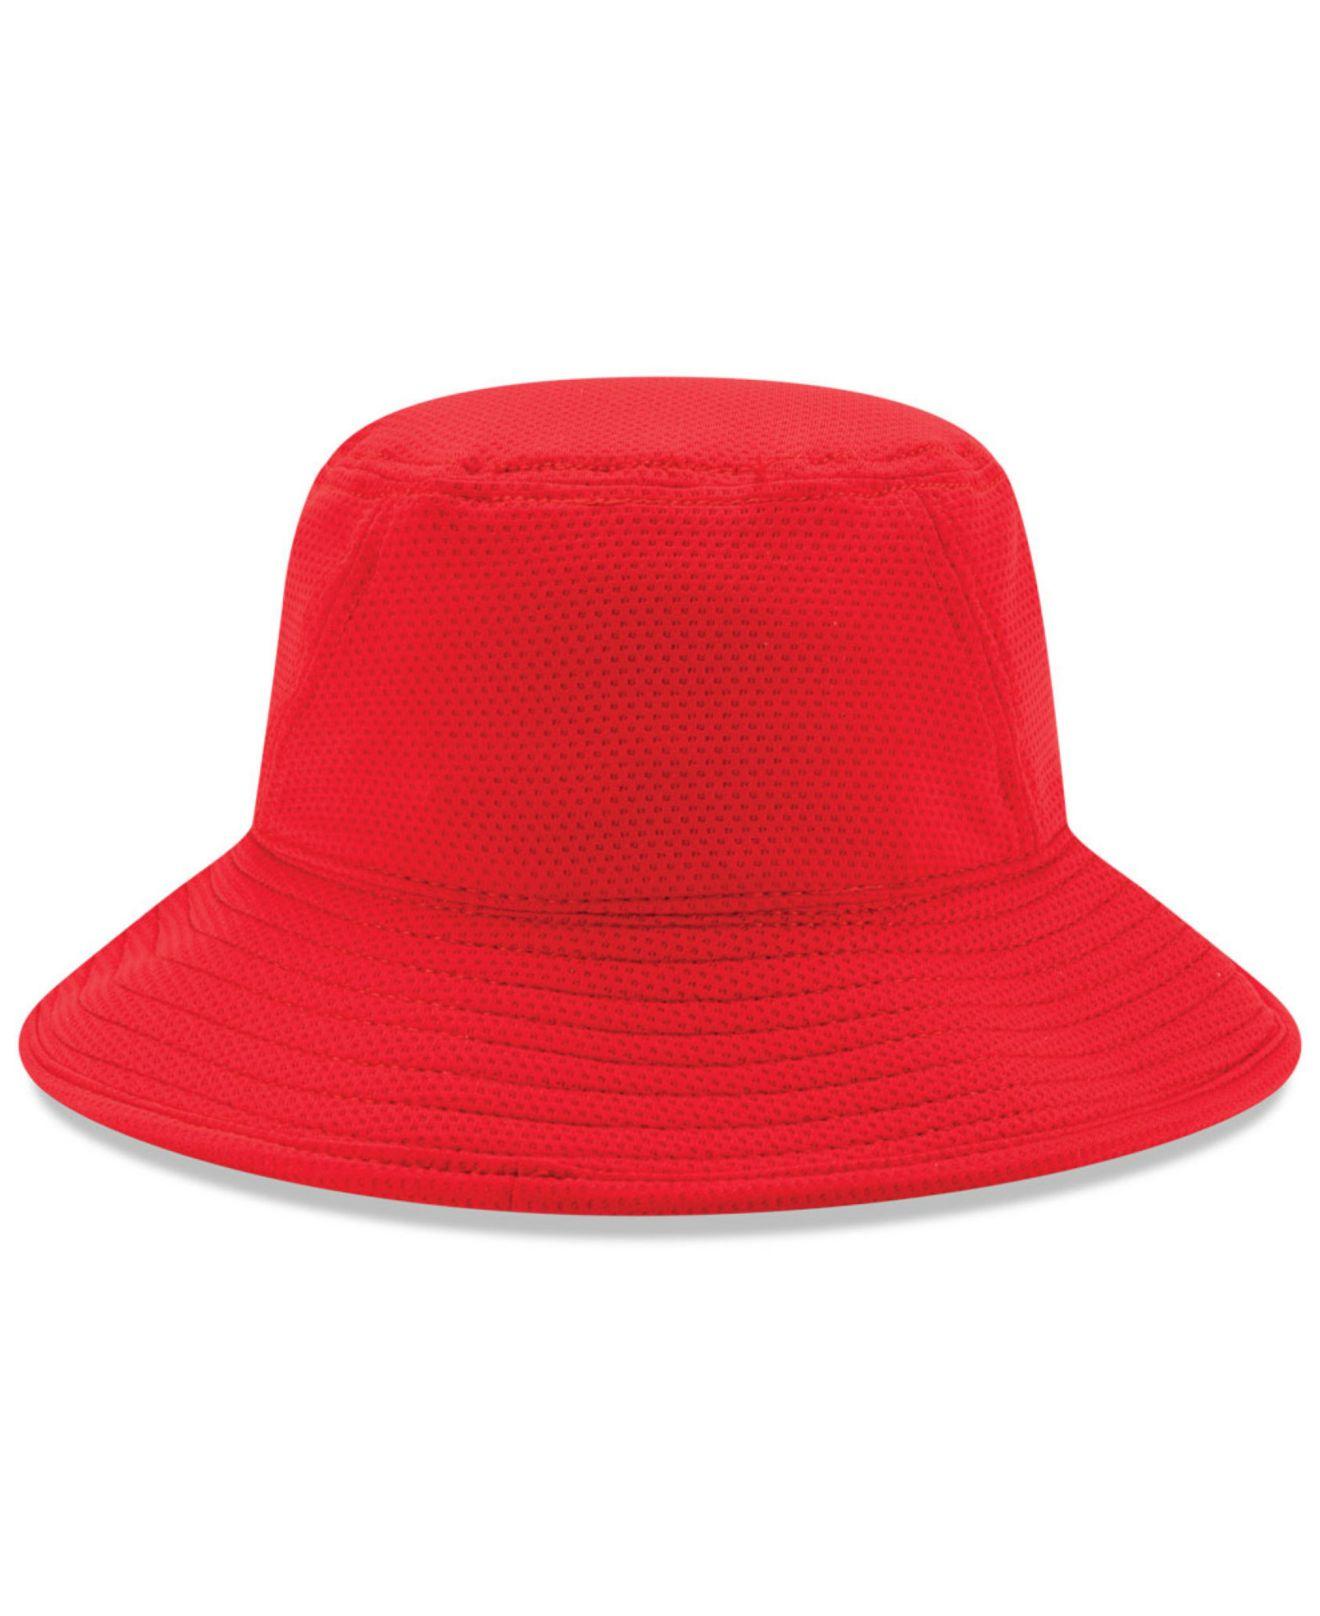 HUF Canvas red bucket hat | Manchester's Premier ...  |Red Bucket Hat